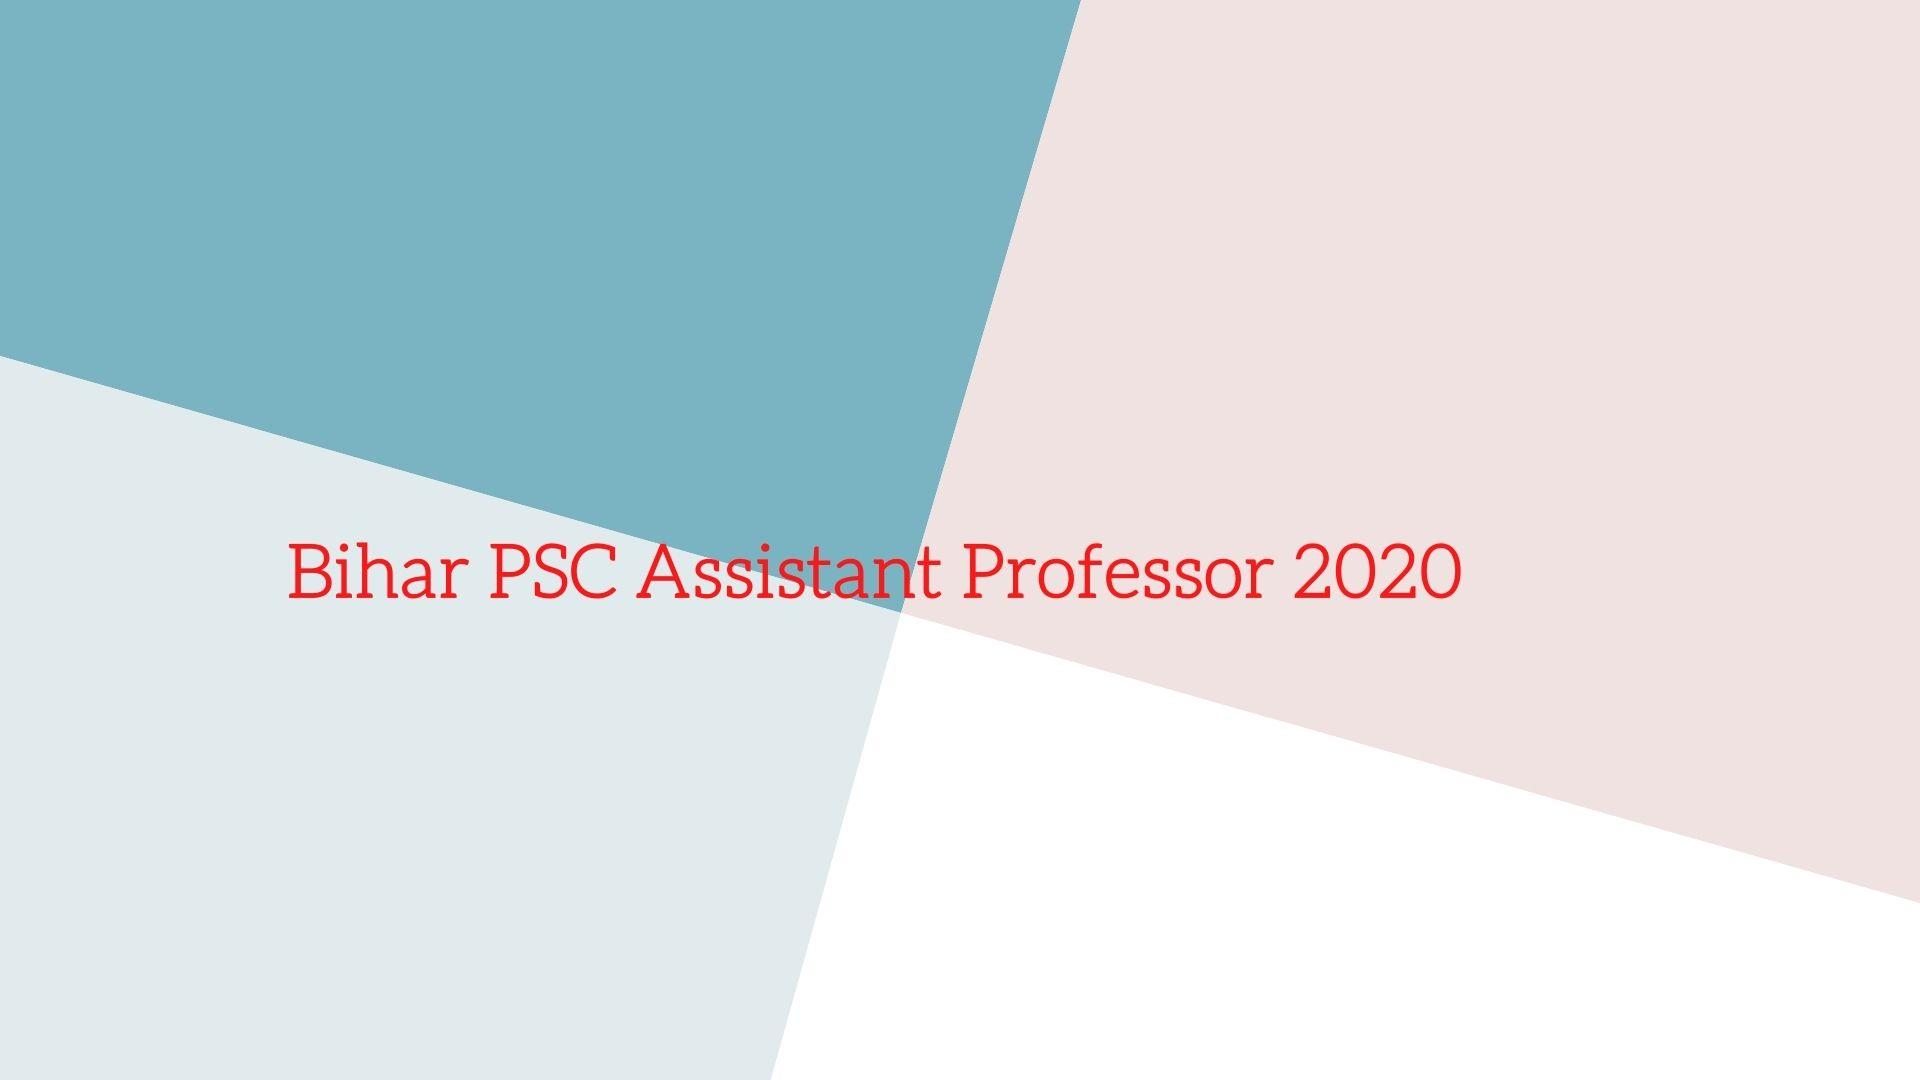 Bihar PSC Assistant Professor 2020